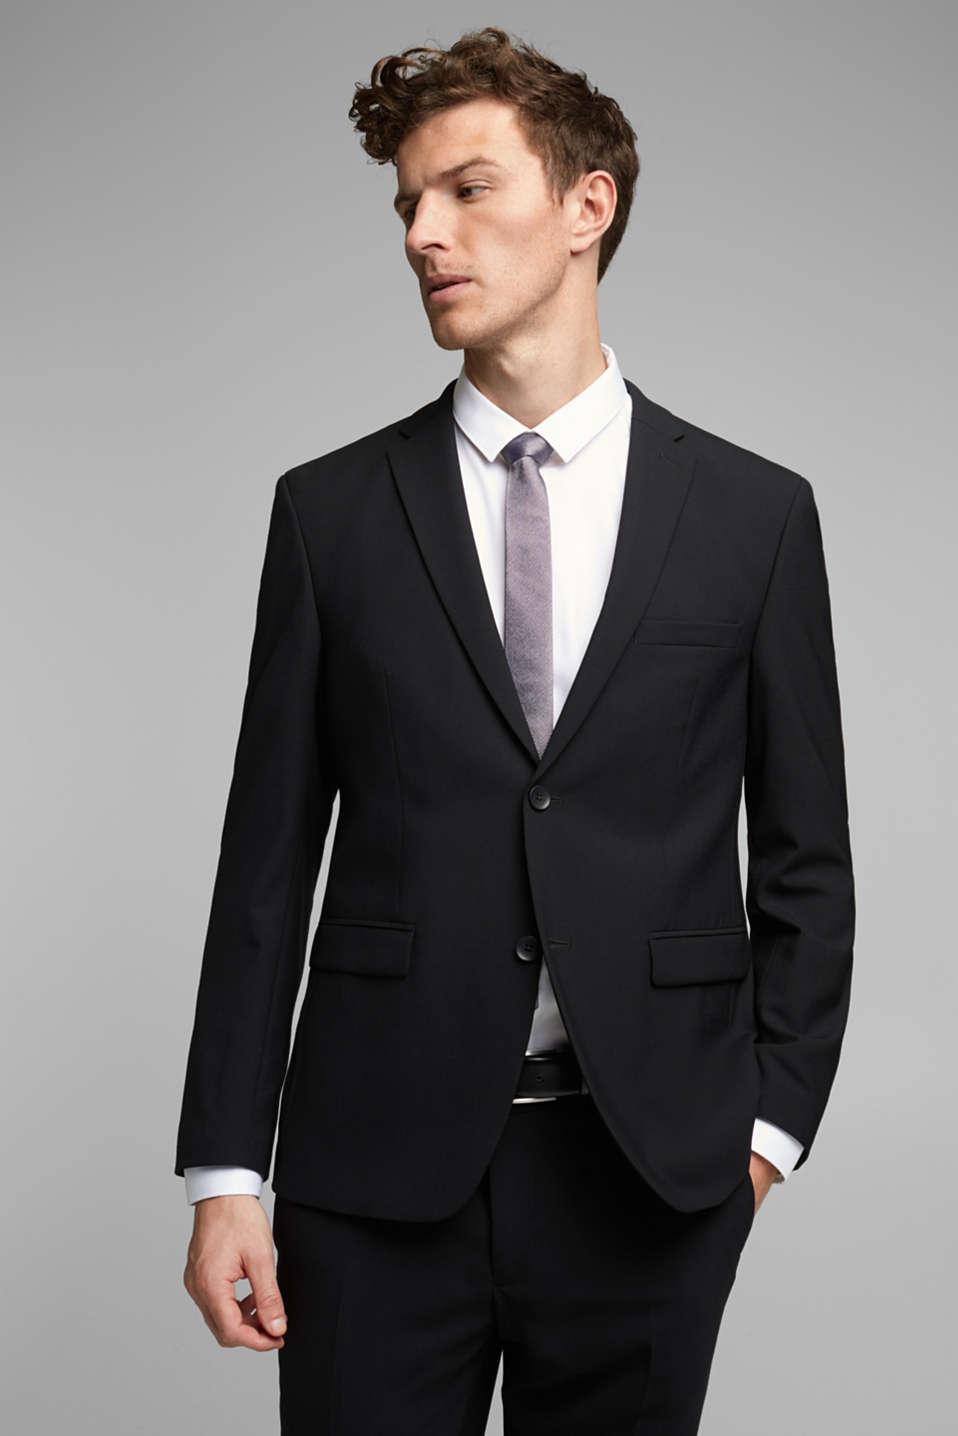 ACTIVE SUIT tailored jacket, wool blend, BLACK, detail image number 0